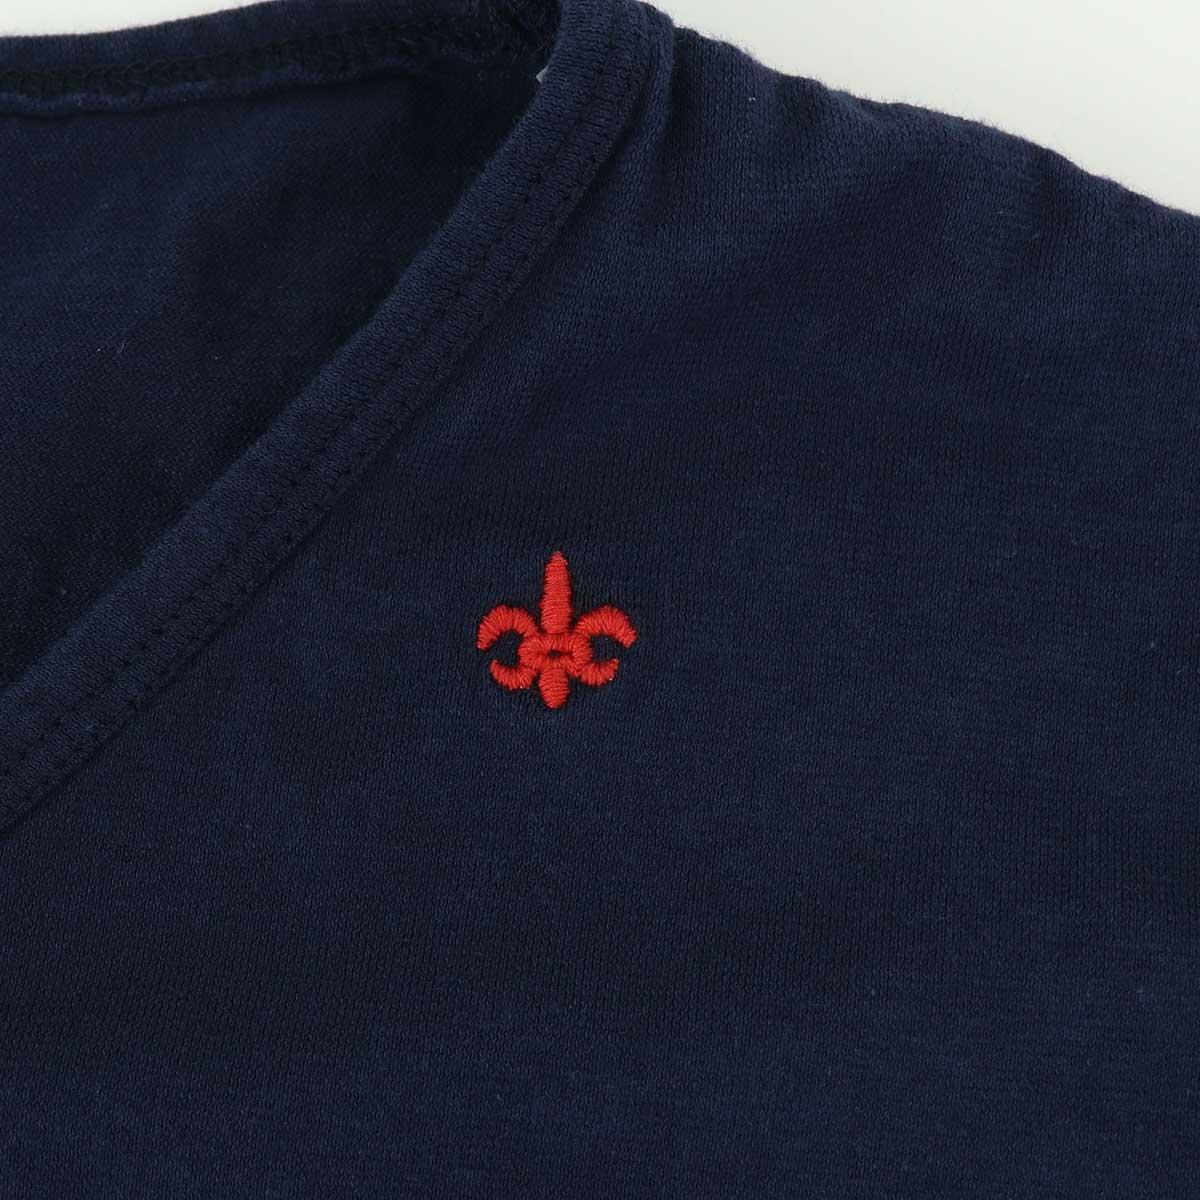 VネックTシャツ 刺繍配色(NAVY)